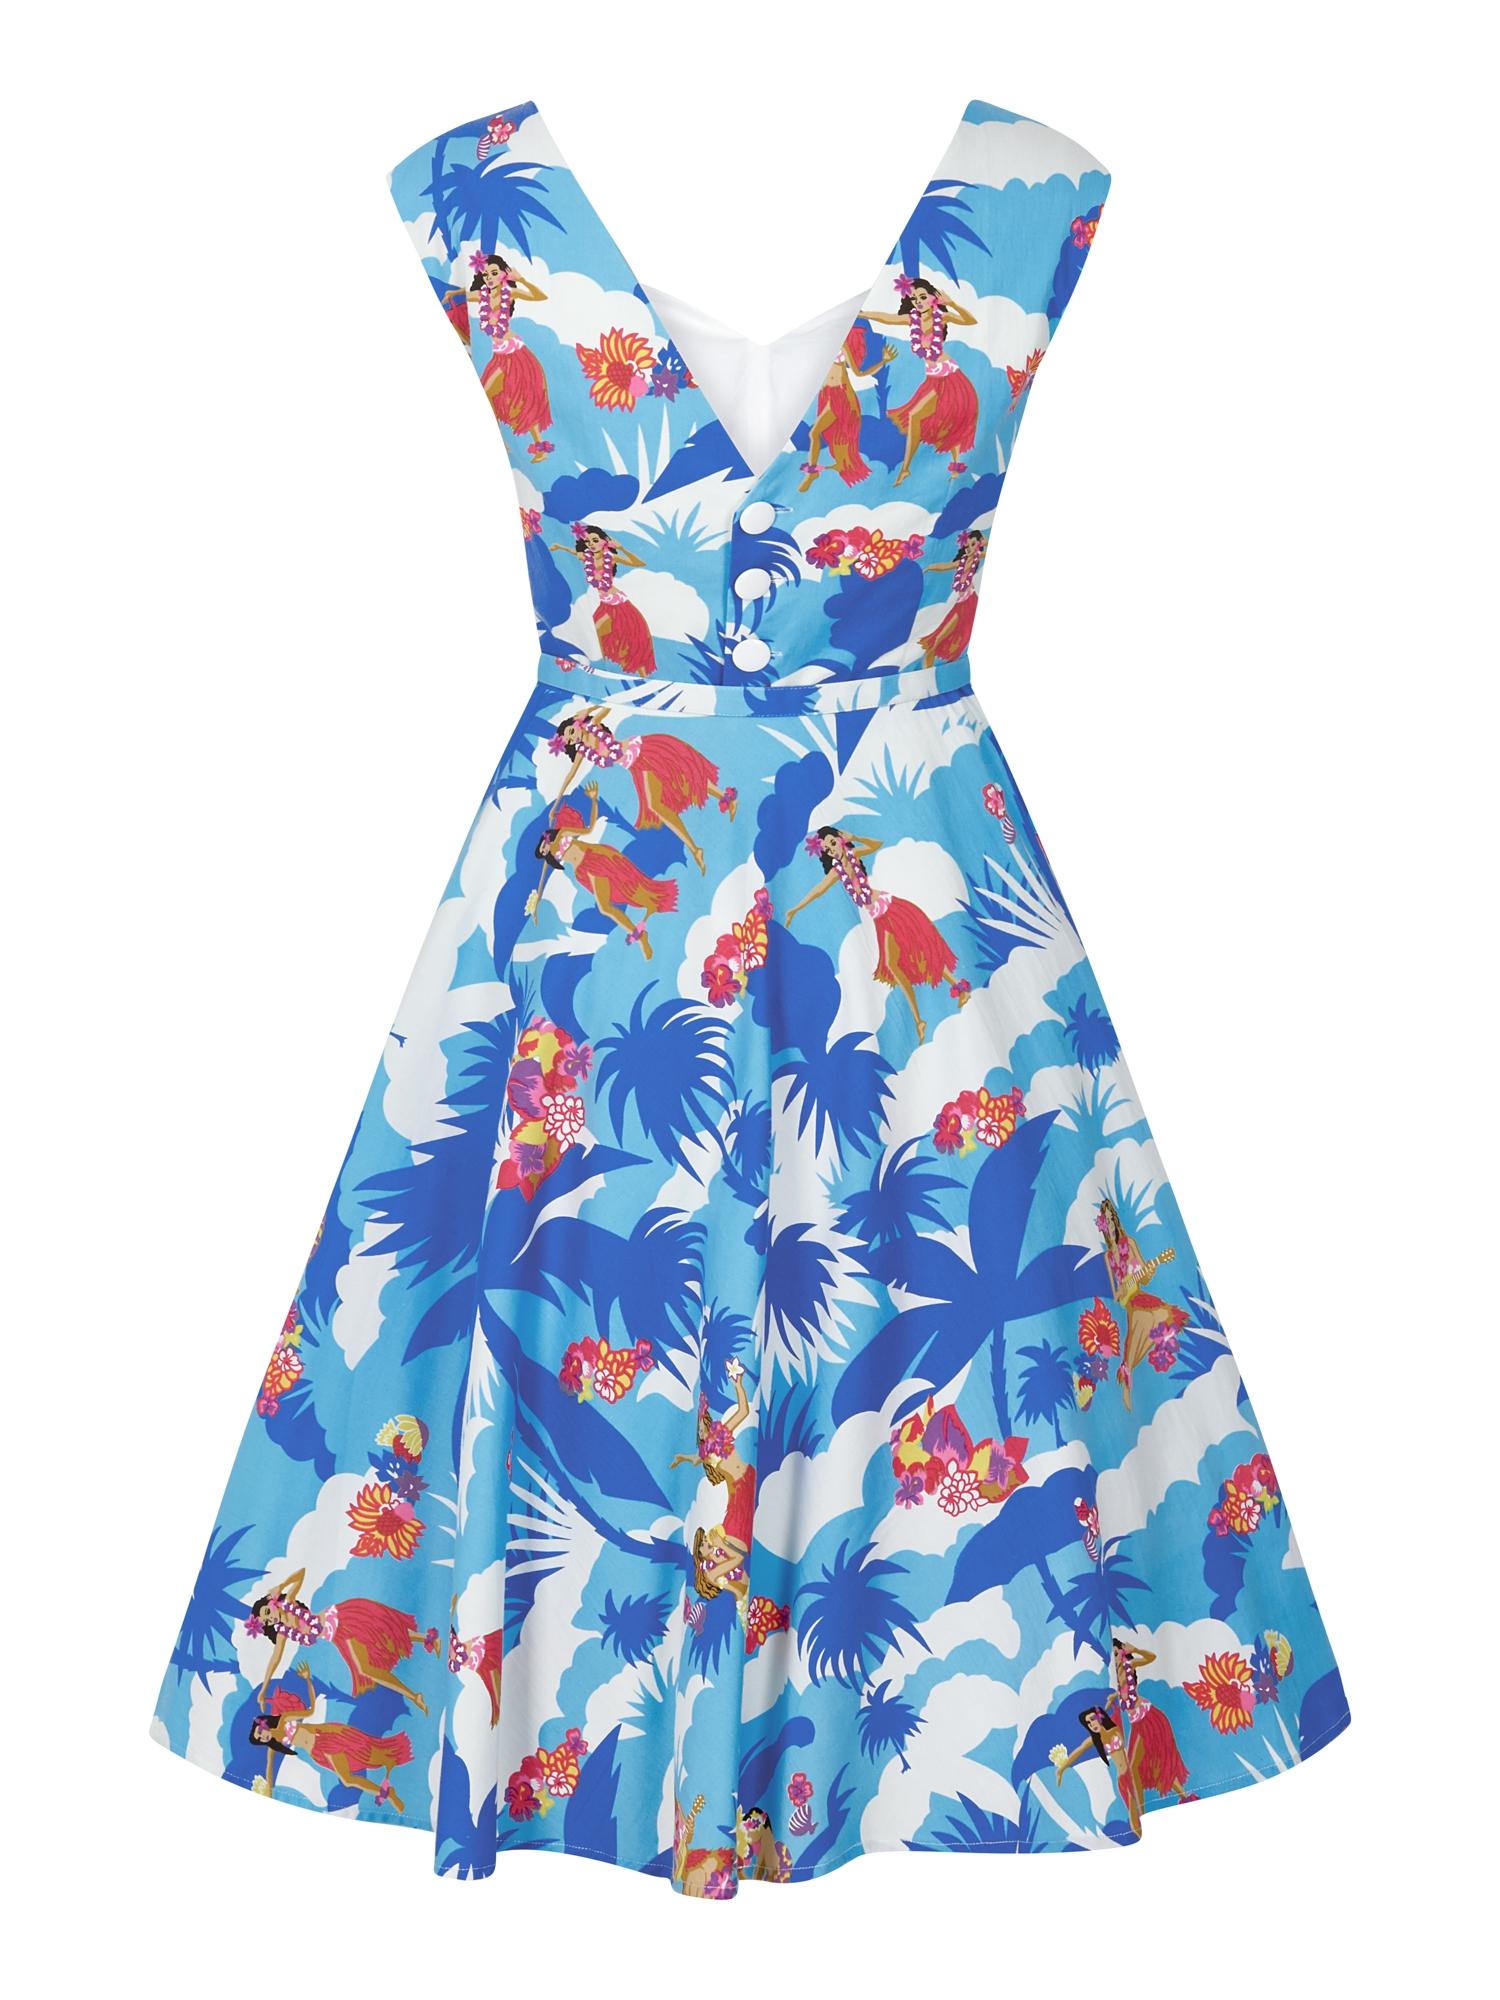 AIDA ZAK COLLECTIF SANDRA HAWAIIAN PRINT DRESS GREEN BLUE SZ 8-22 1950S